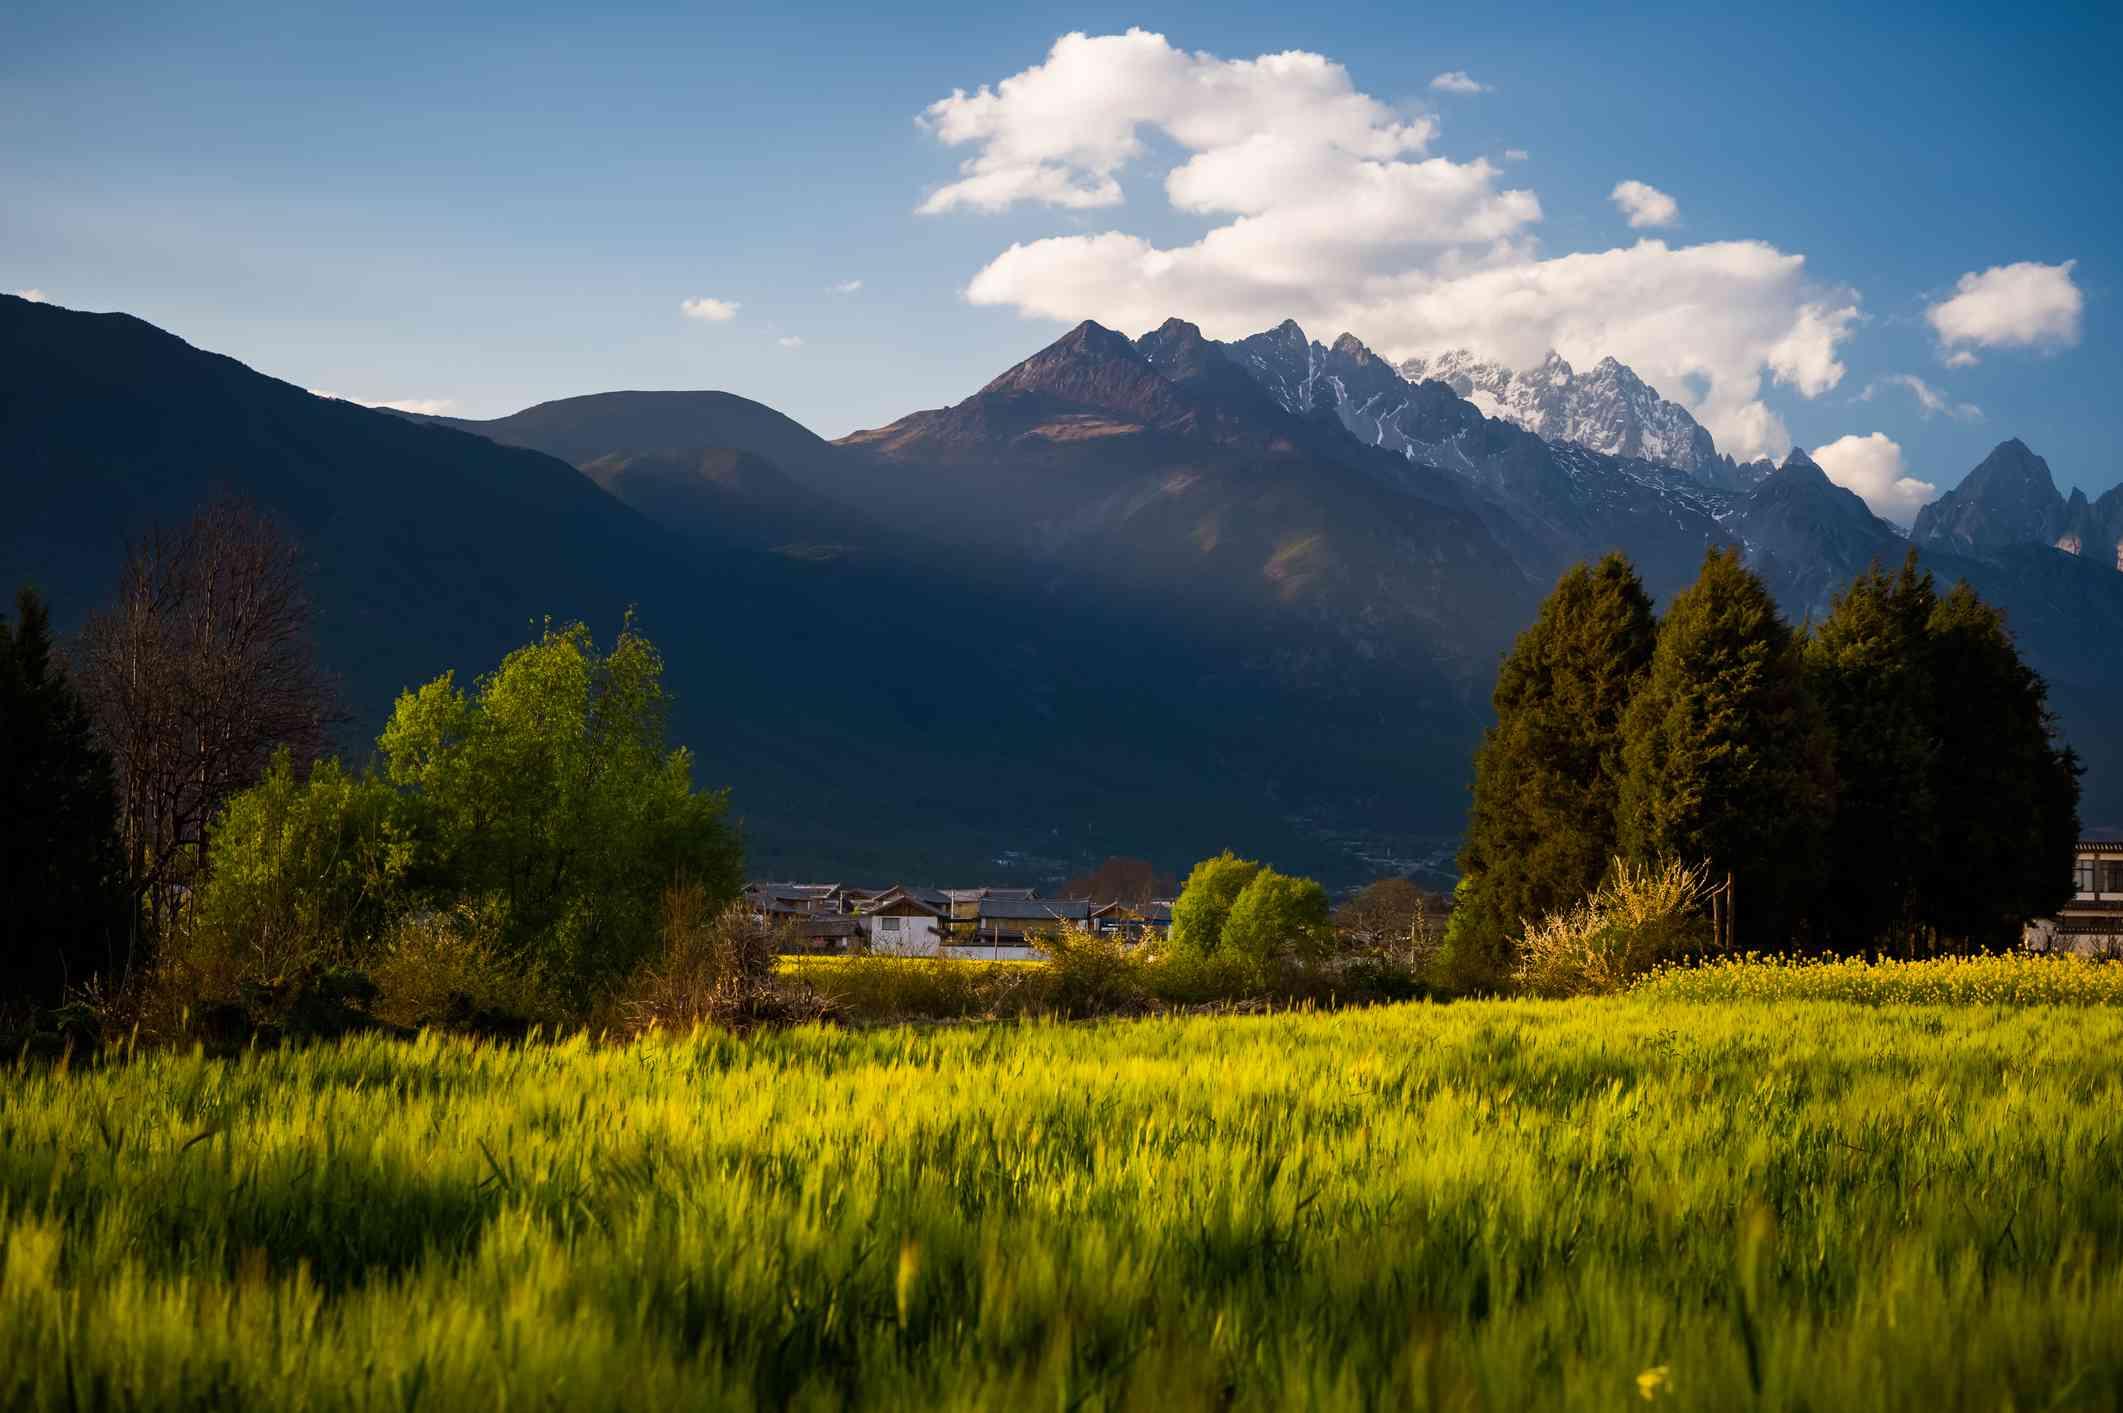 rural scenic in Lijiang countryside, yunnan province, china